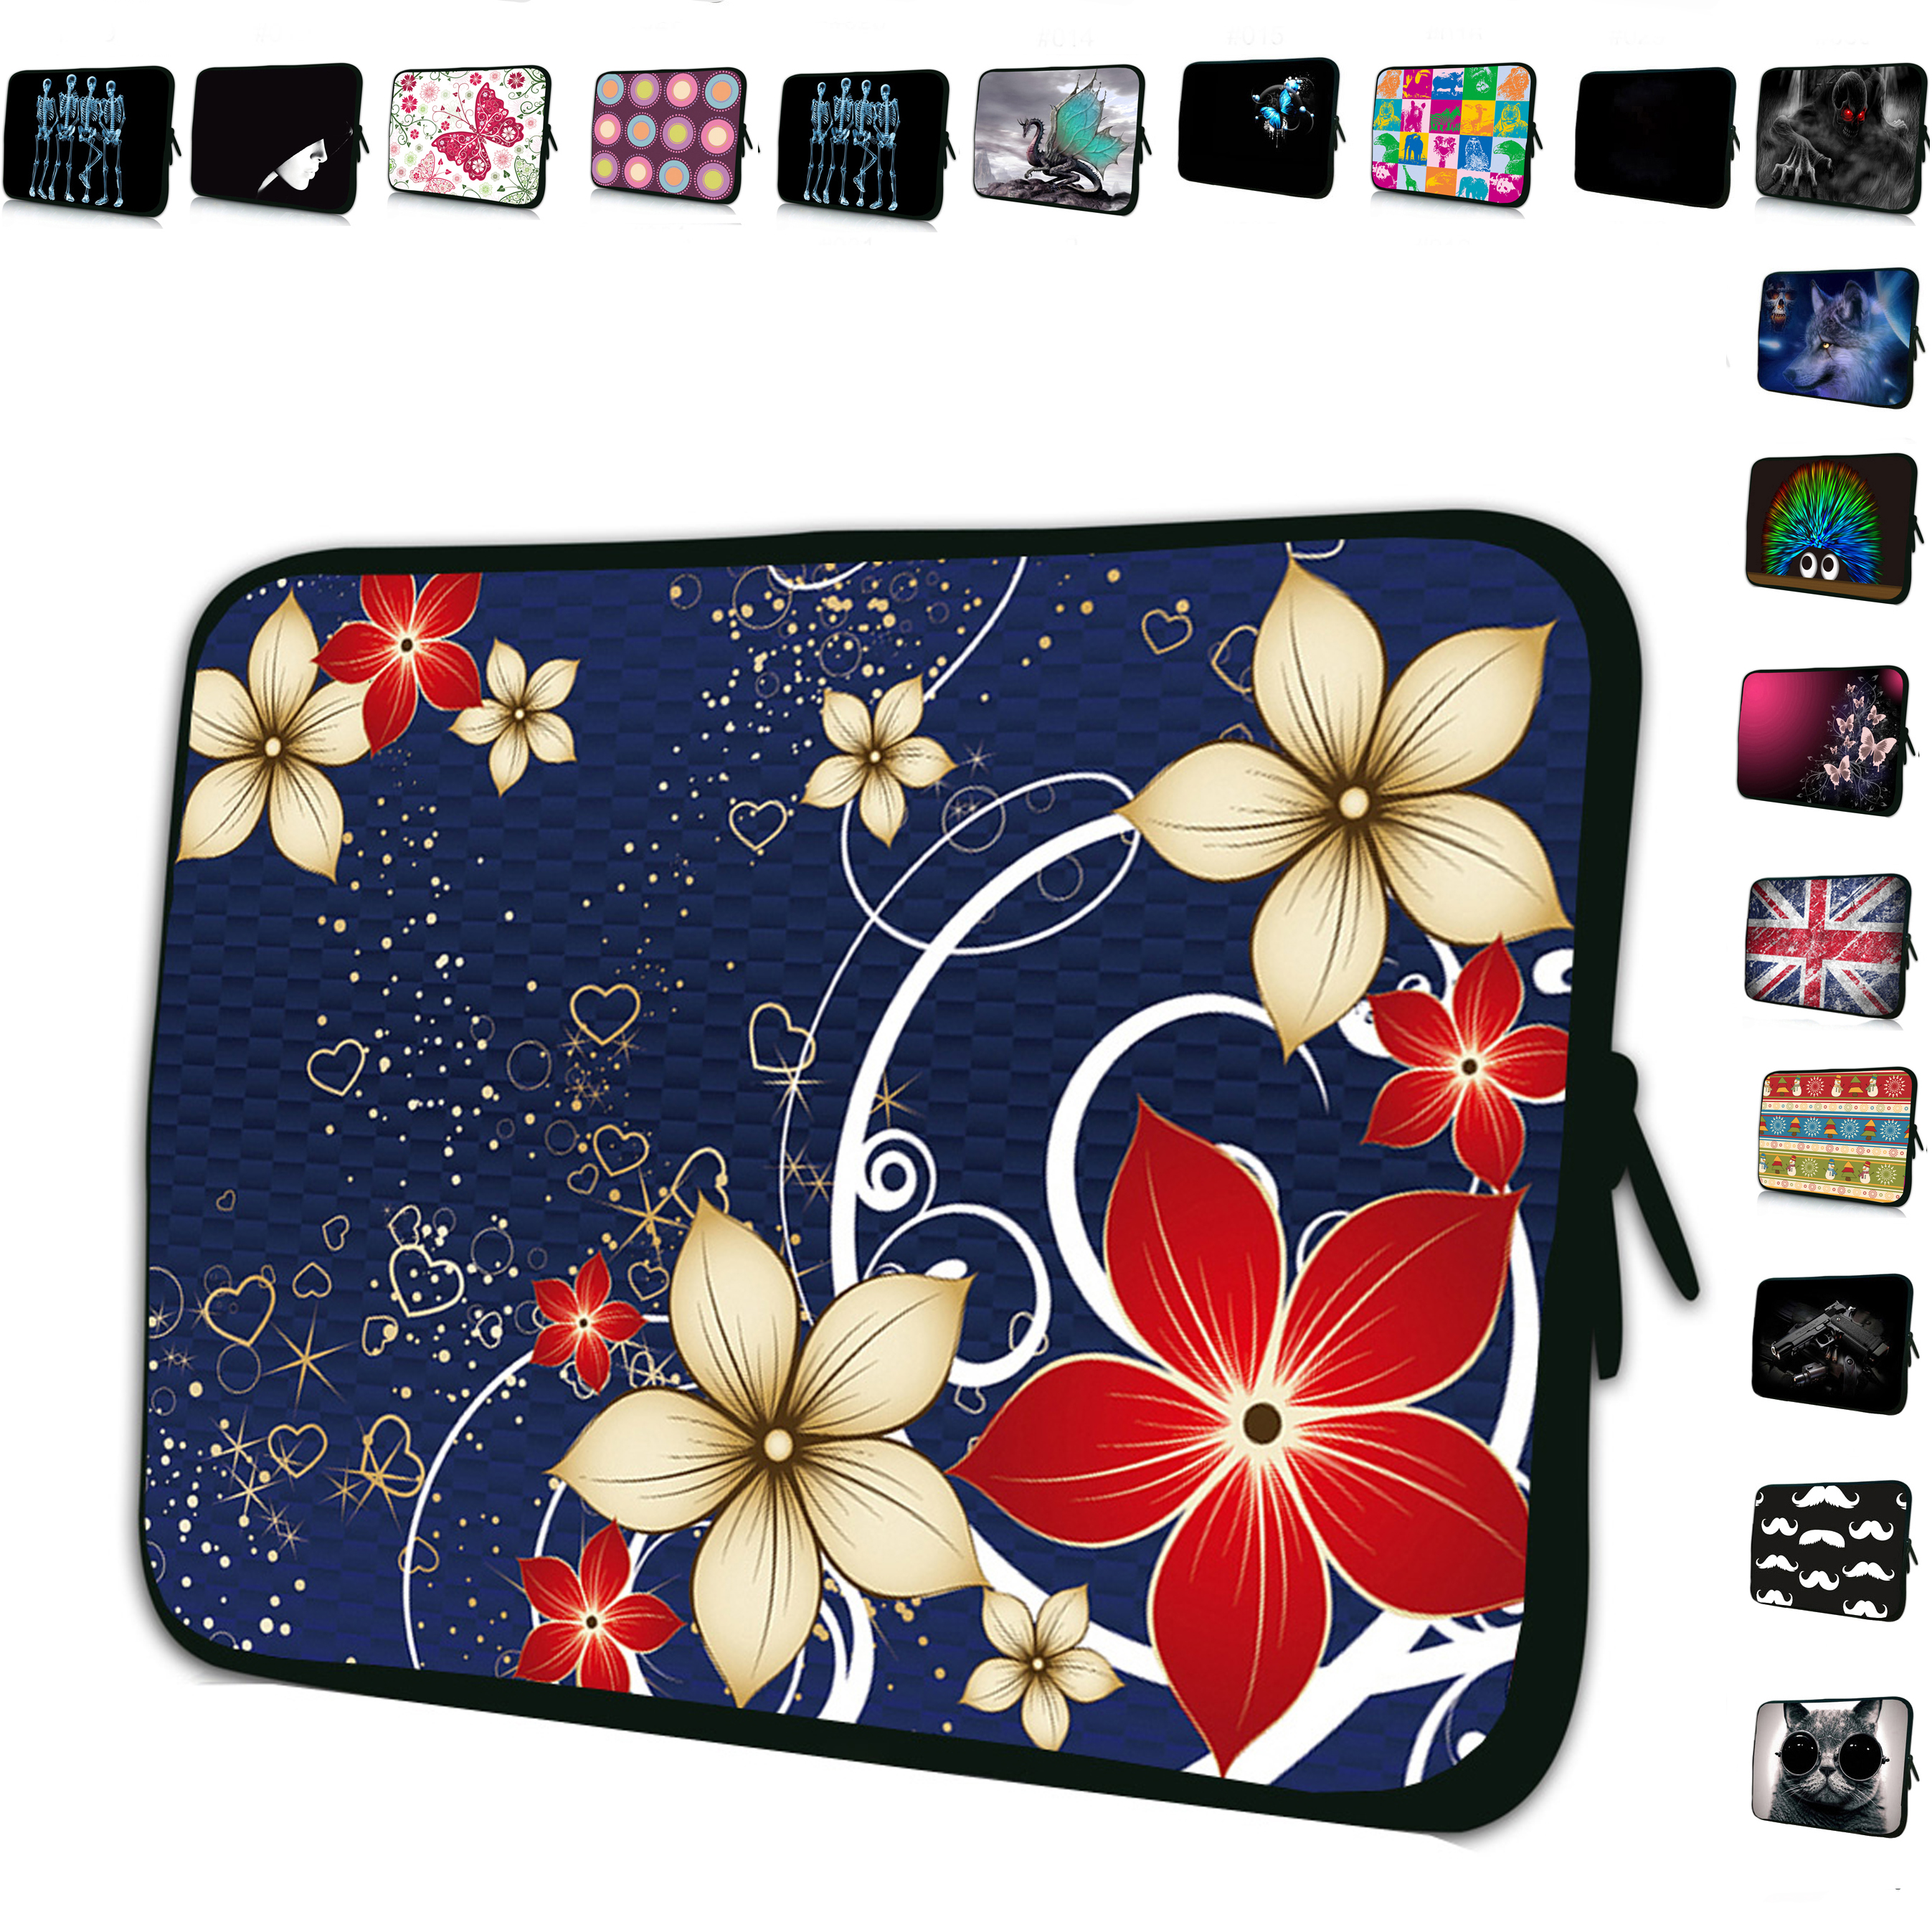 все цены на Portable Tablet 10 inch 10.1 Sleeve Bags Zipper Neoprene Cover Pouch For samsung galaxy tab s2 9.7 Ipad Air 5 4 4th 3 3rd 2 9.7 онлайн